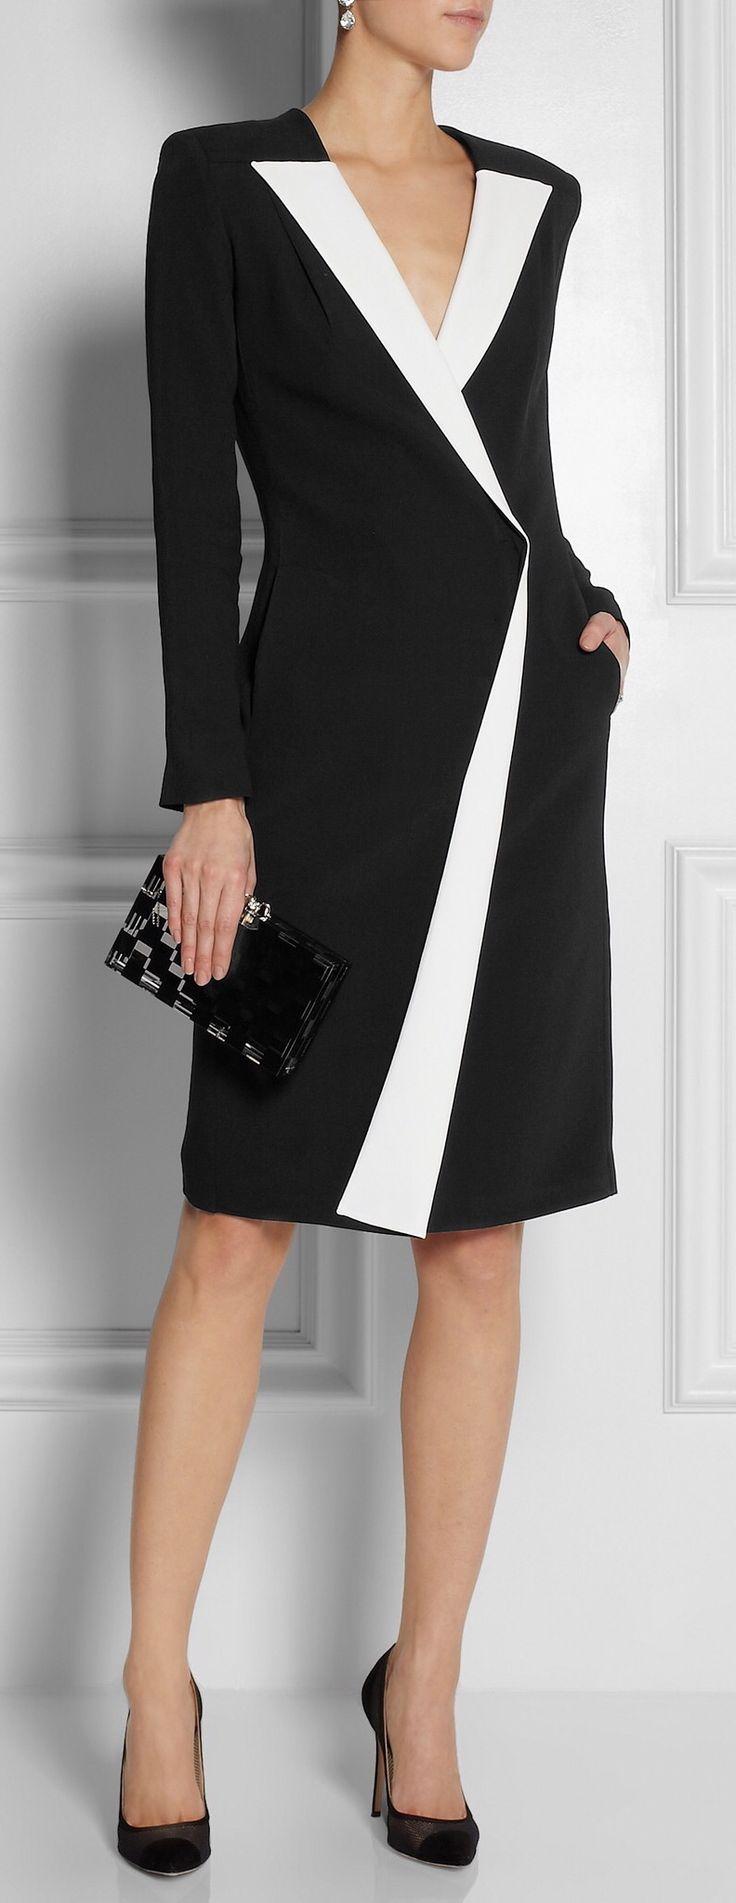 Robe cintrée, col blanc en V, pochette noire #veredus